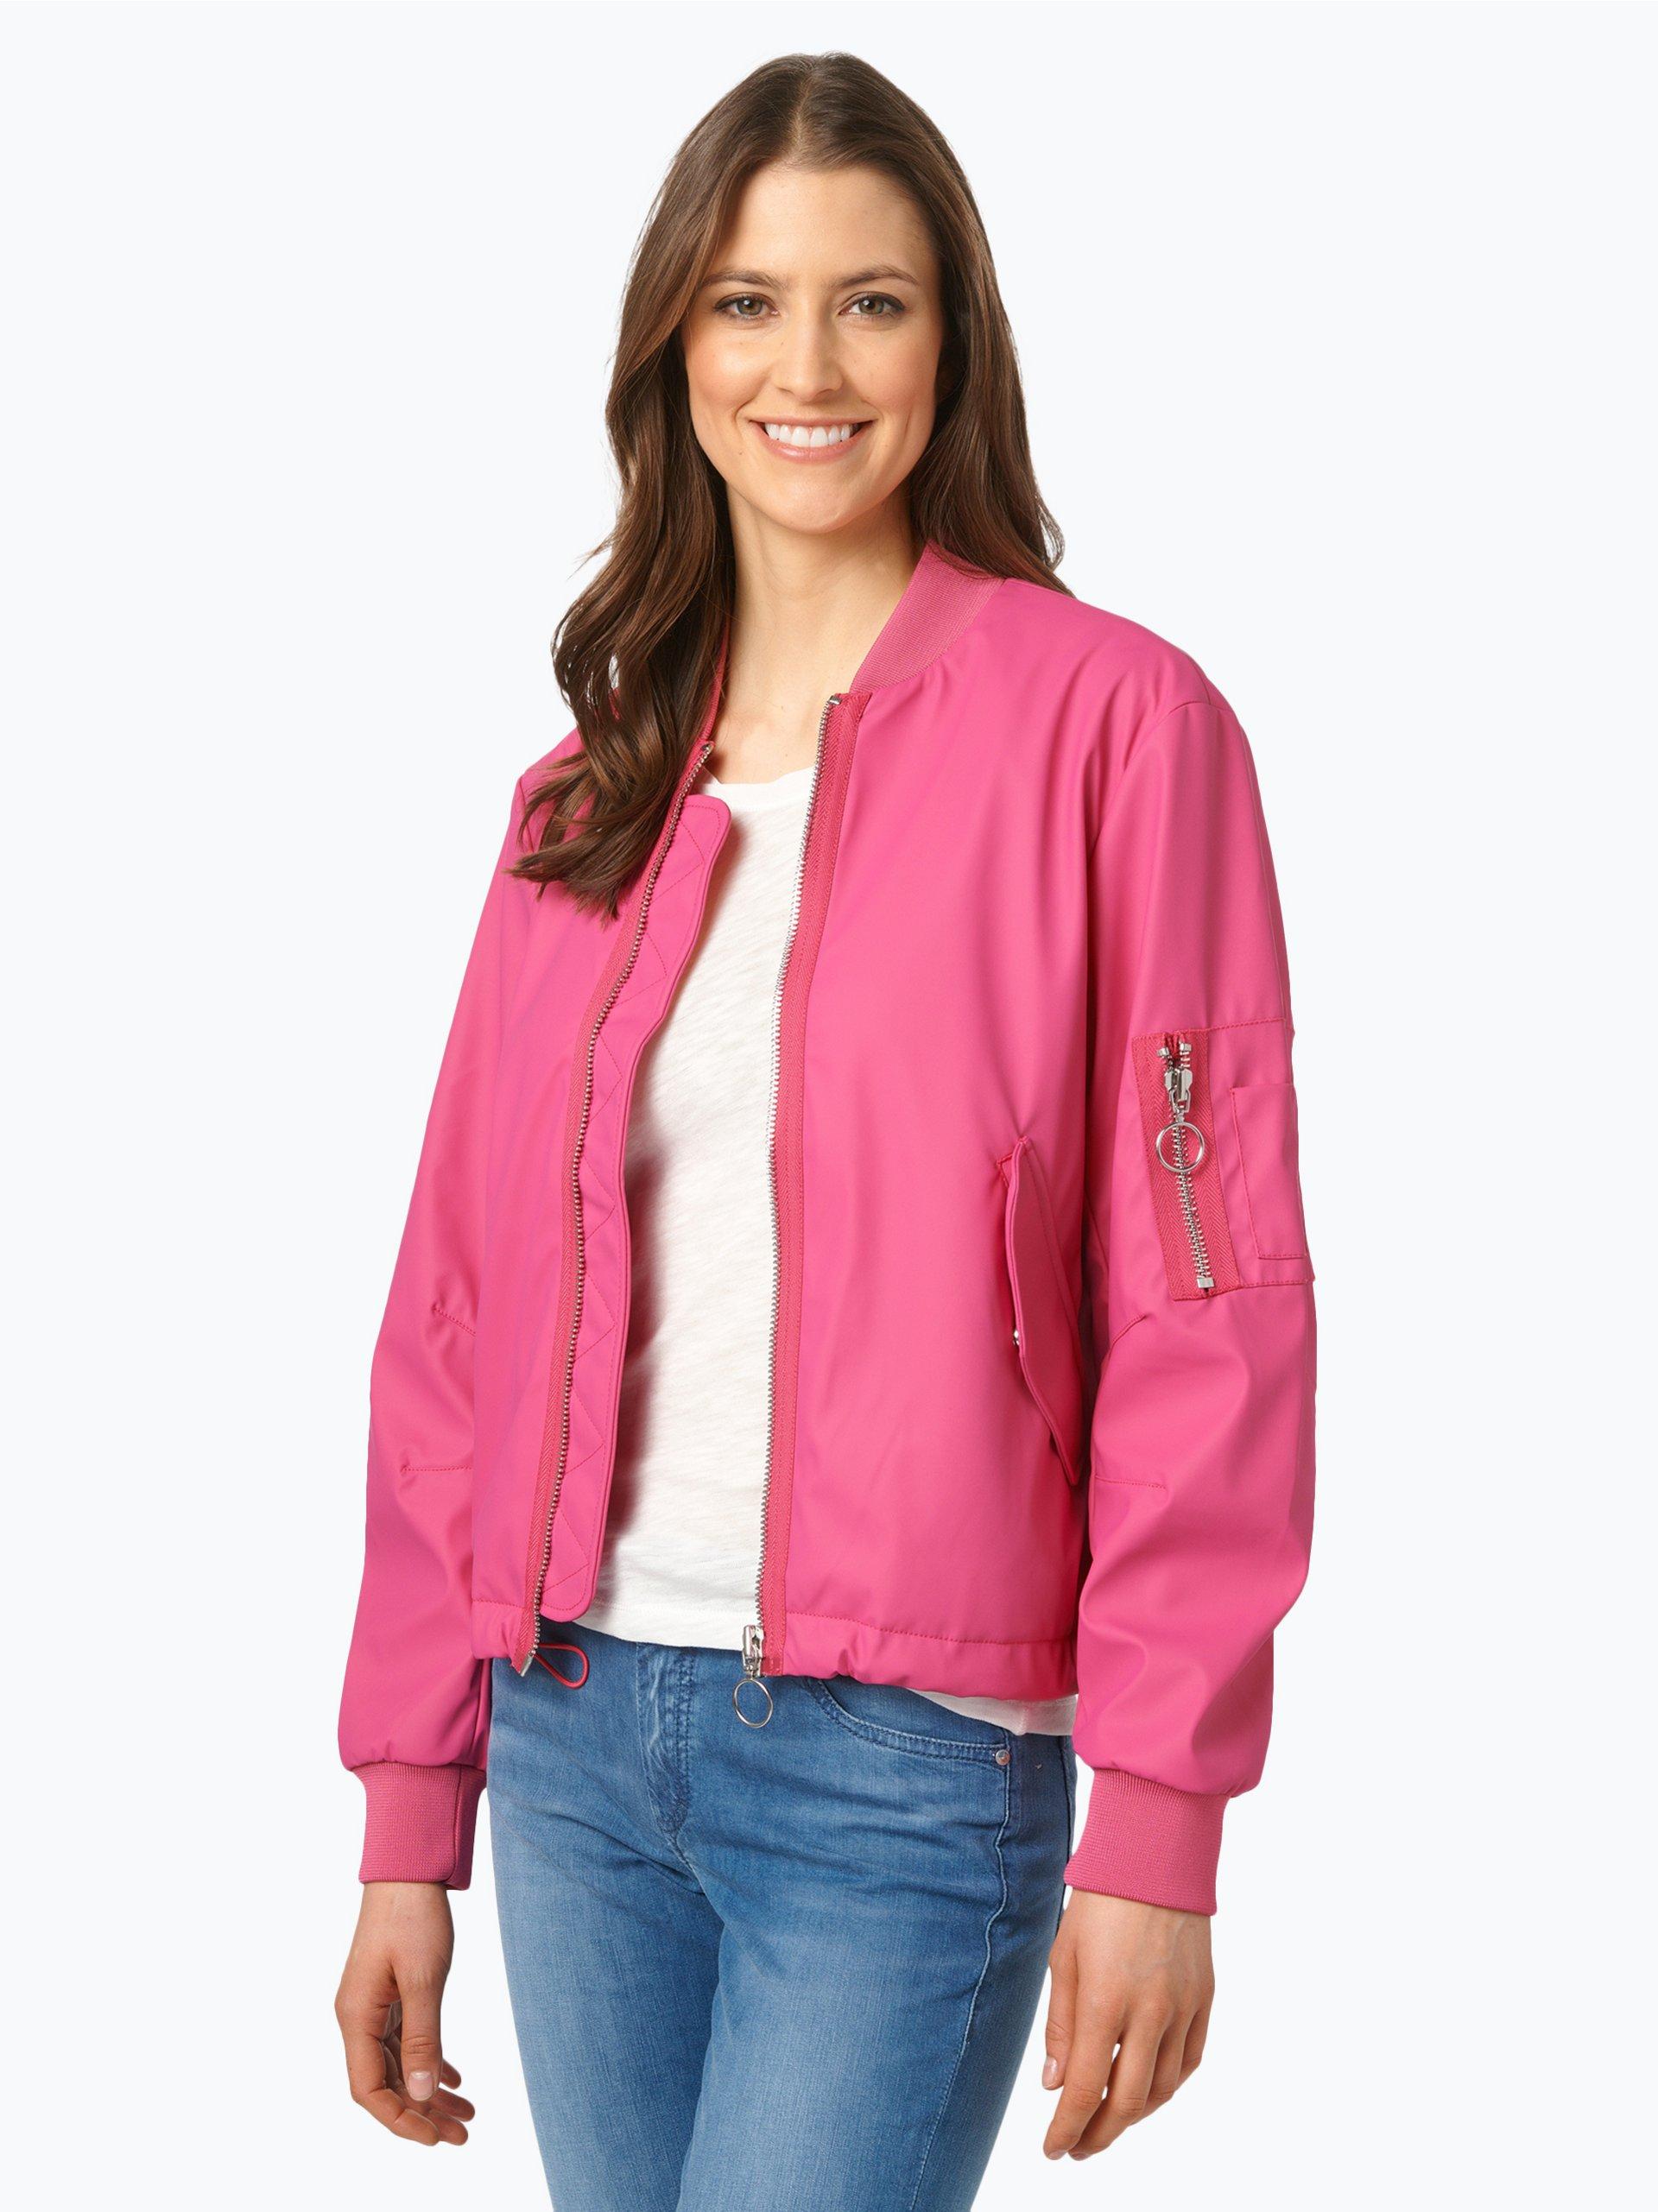 marc o 39 polo denim damen jacke pink uni online kaufen peek und cloppenburg de. Black Bedroom Furniture Sets. Home Design Ideas